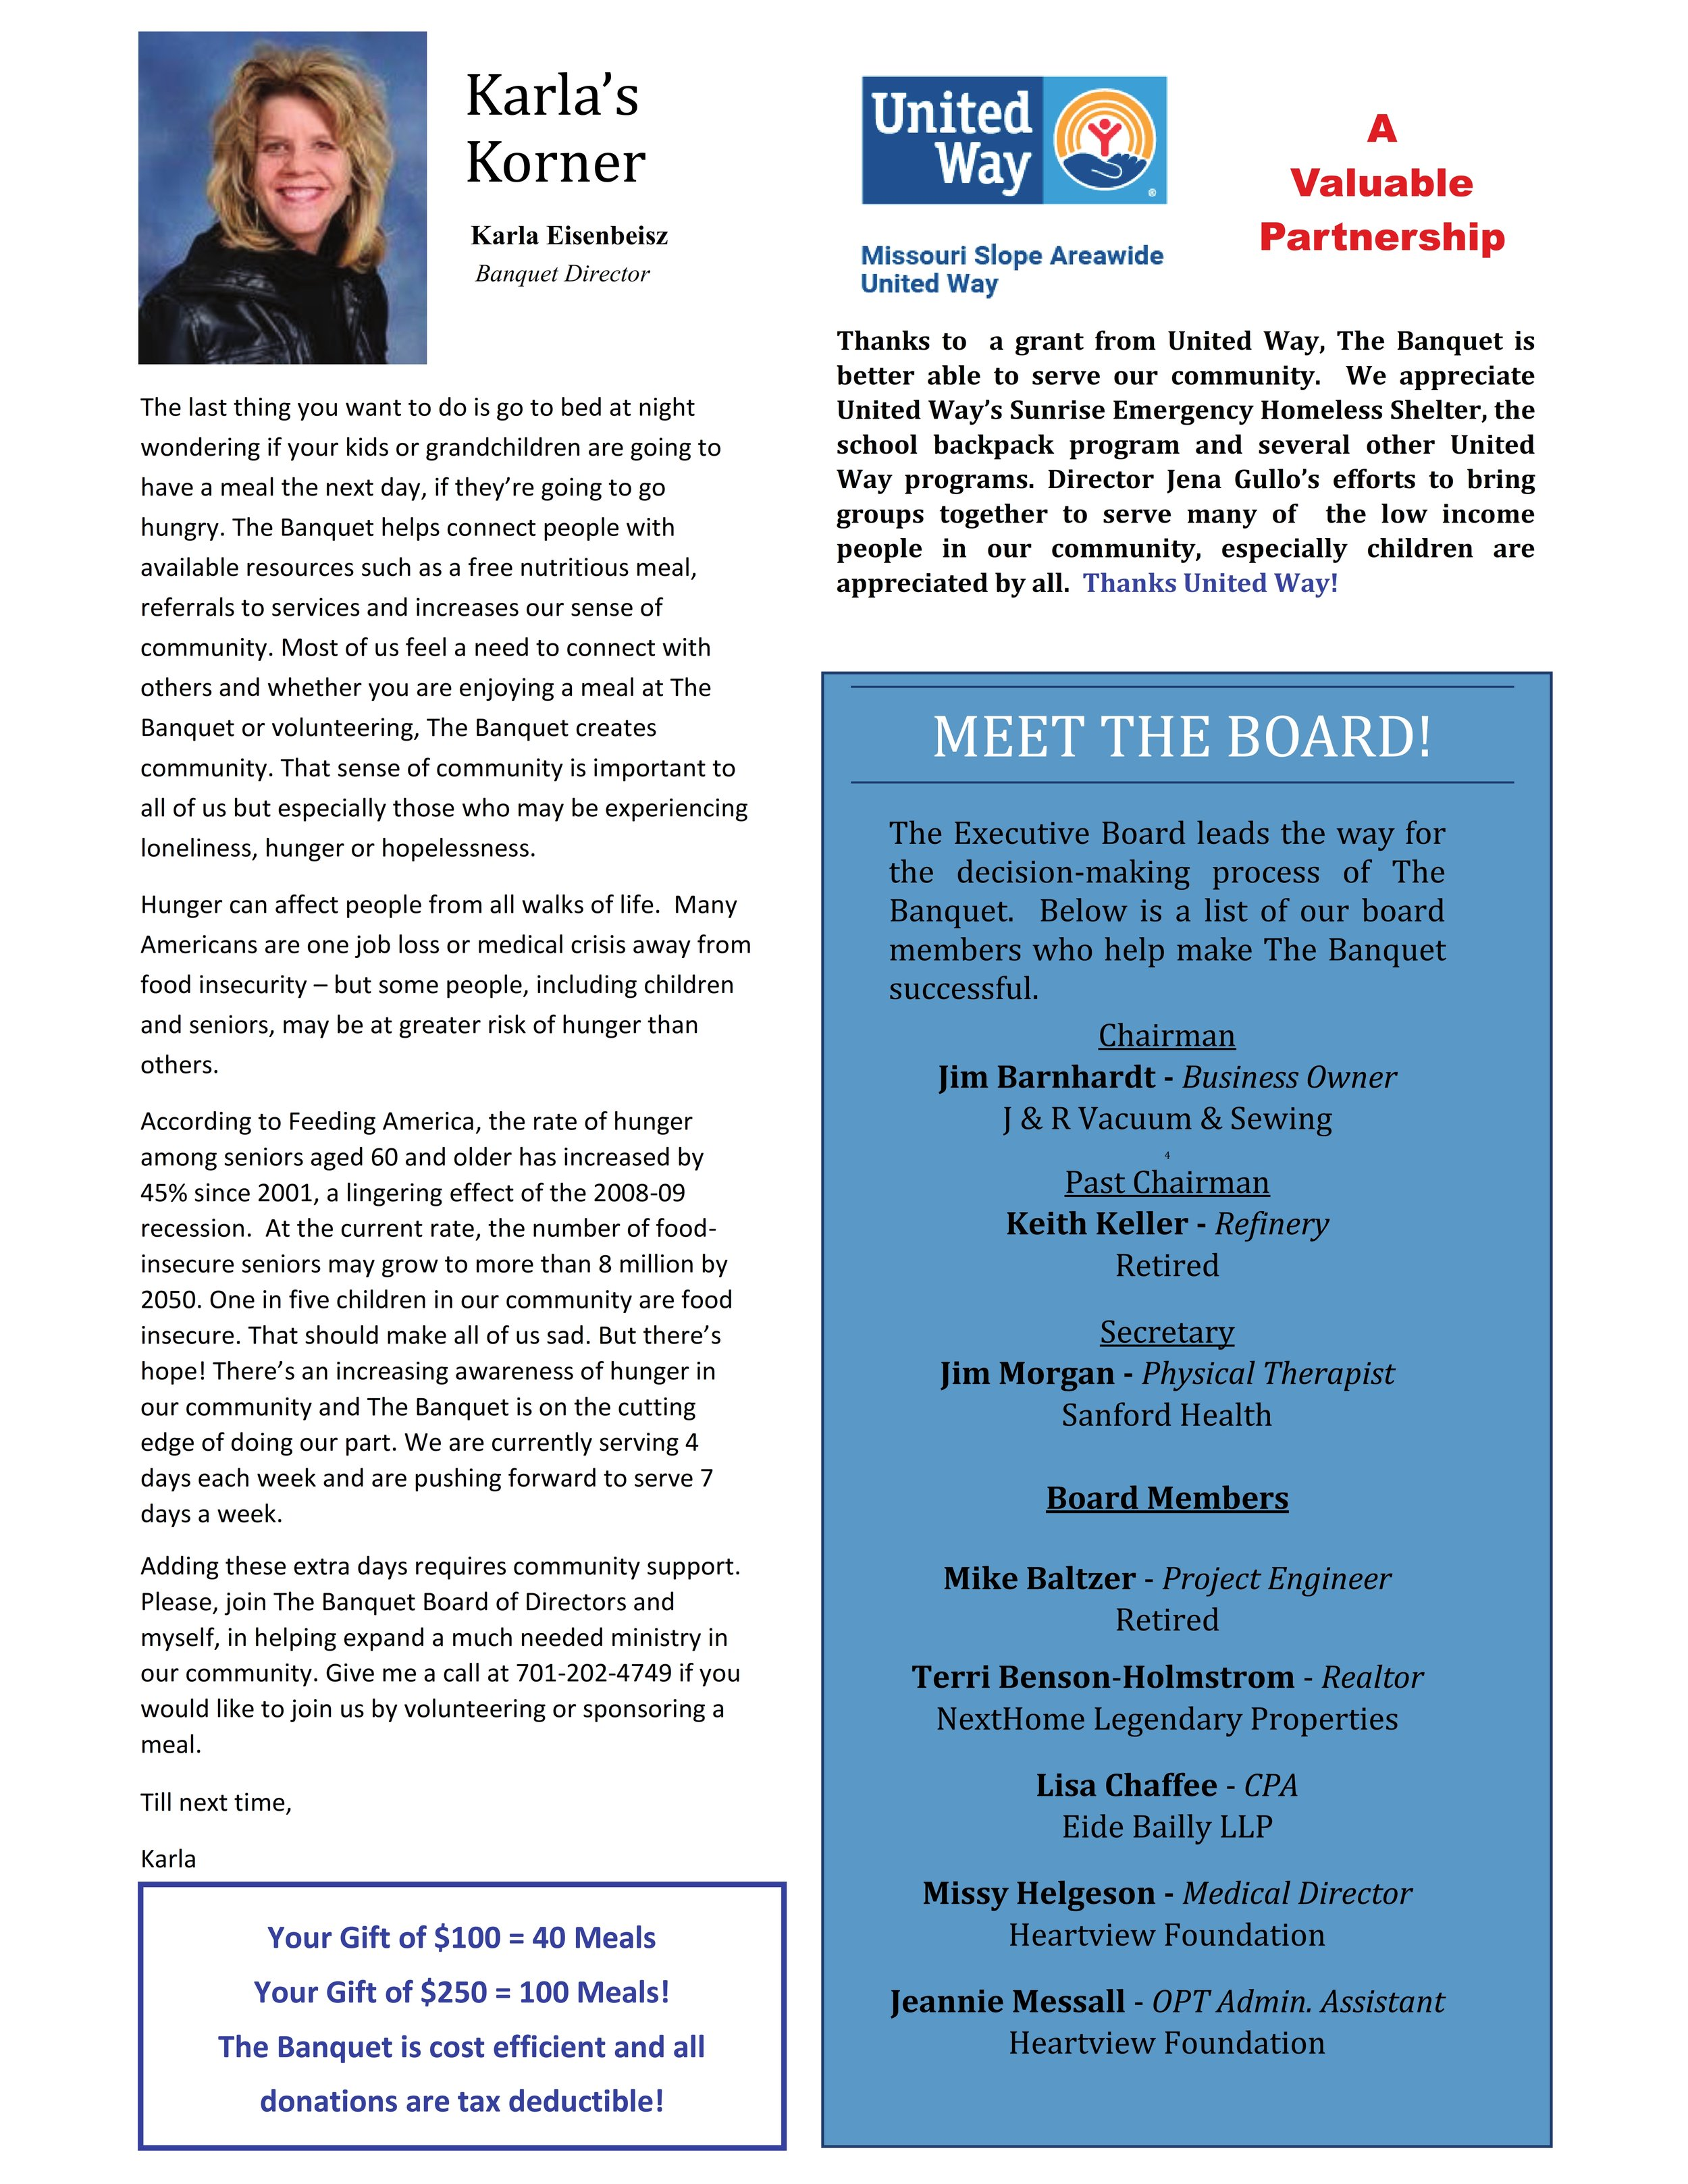 Banquet Newsletter Final Complete-Image Printing-Jan. 22, 2019_002.jpg